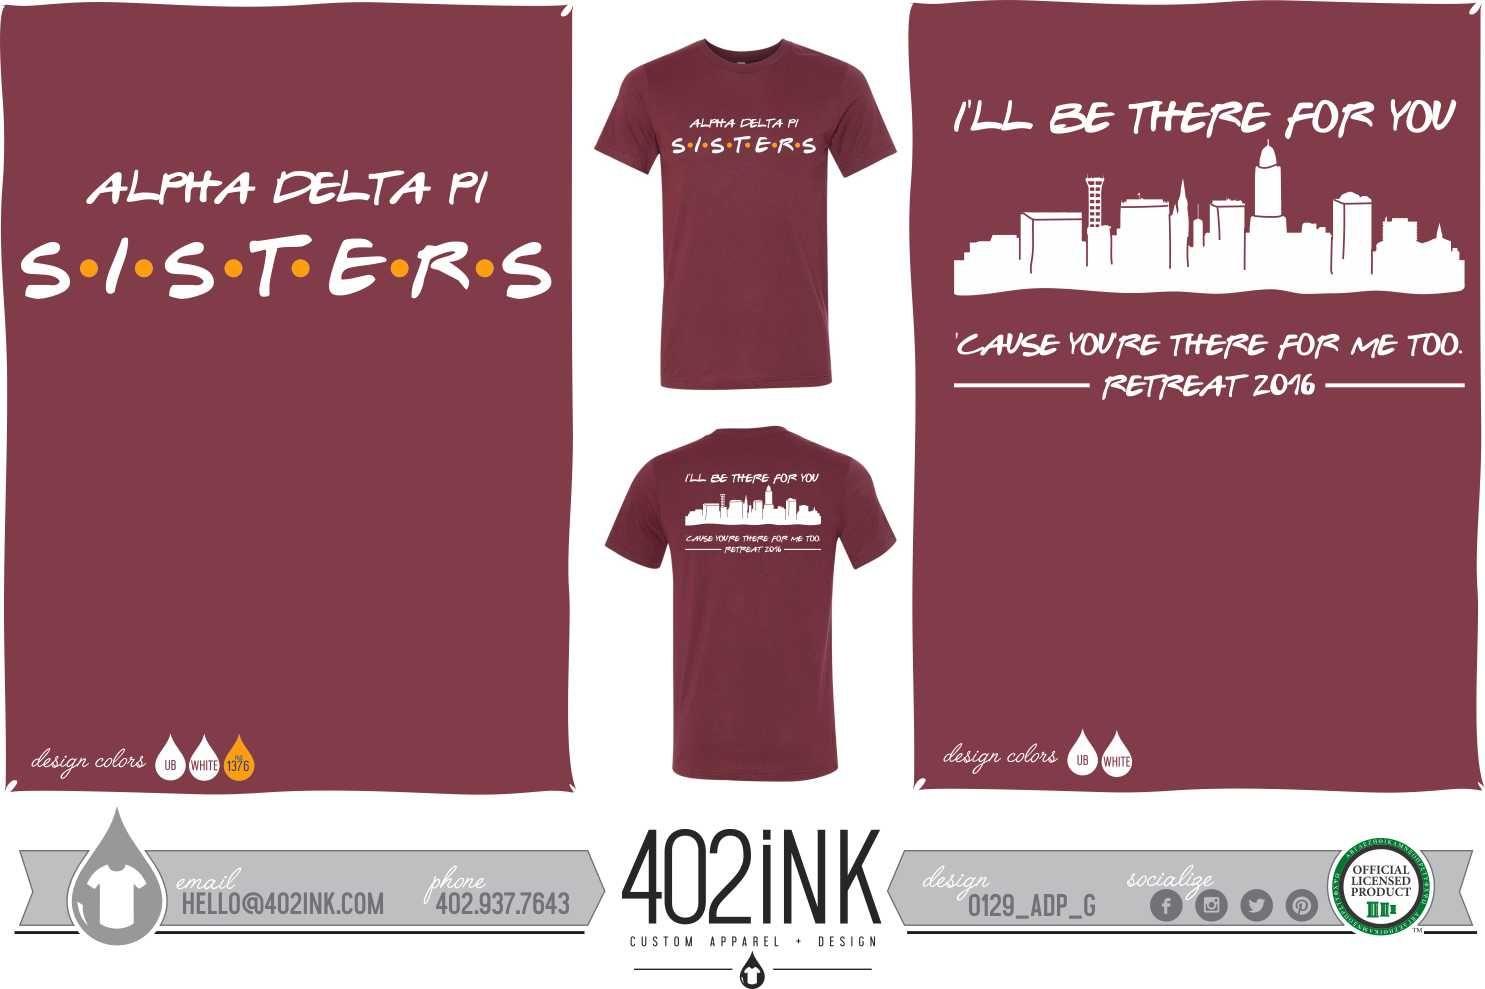 402ink #402style 402ink, Custom Apparel, Greek T-shirts, Sorority T